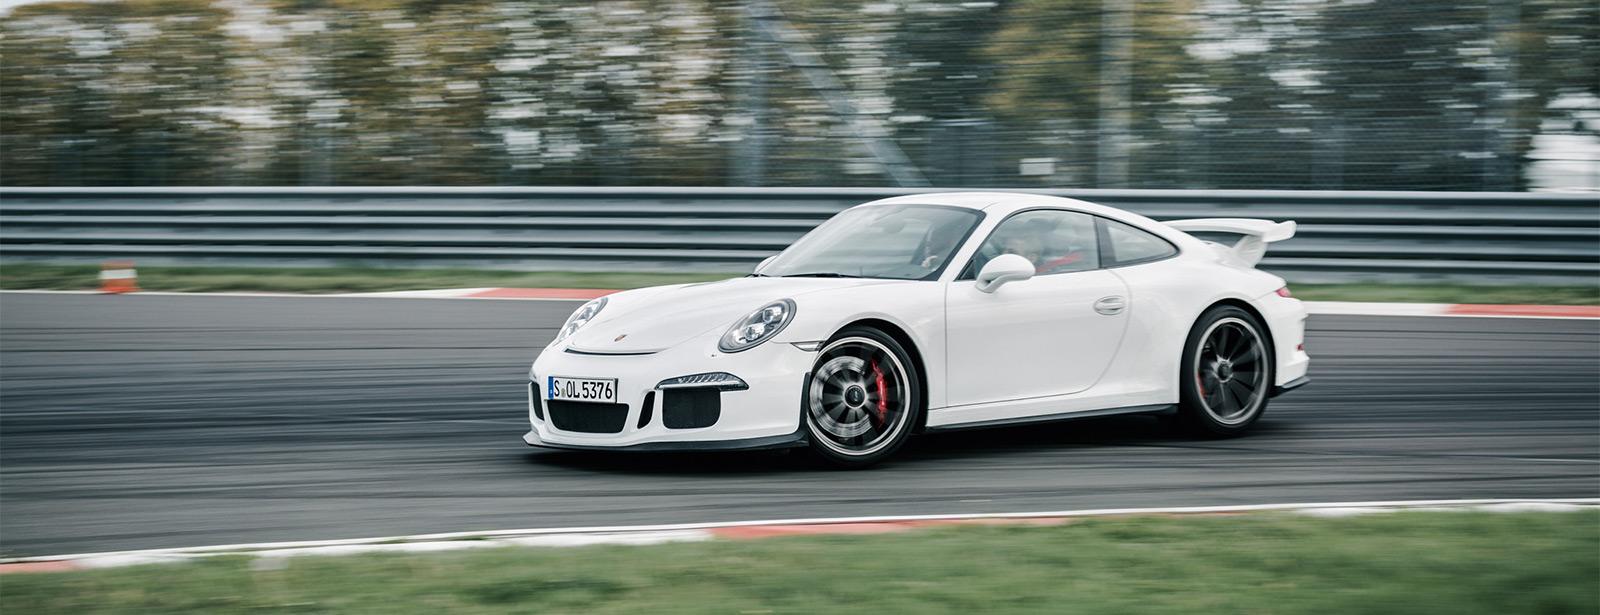 Events 2017 | Porsche Rendezvous